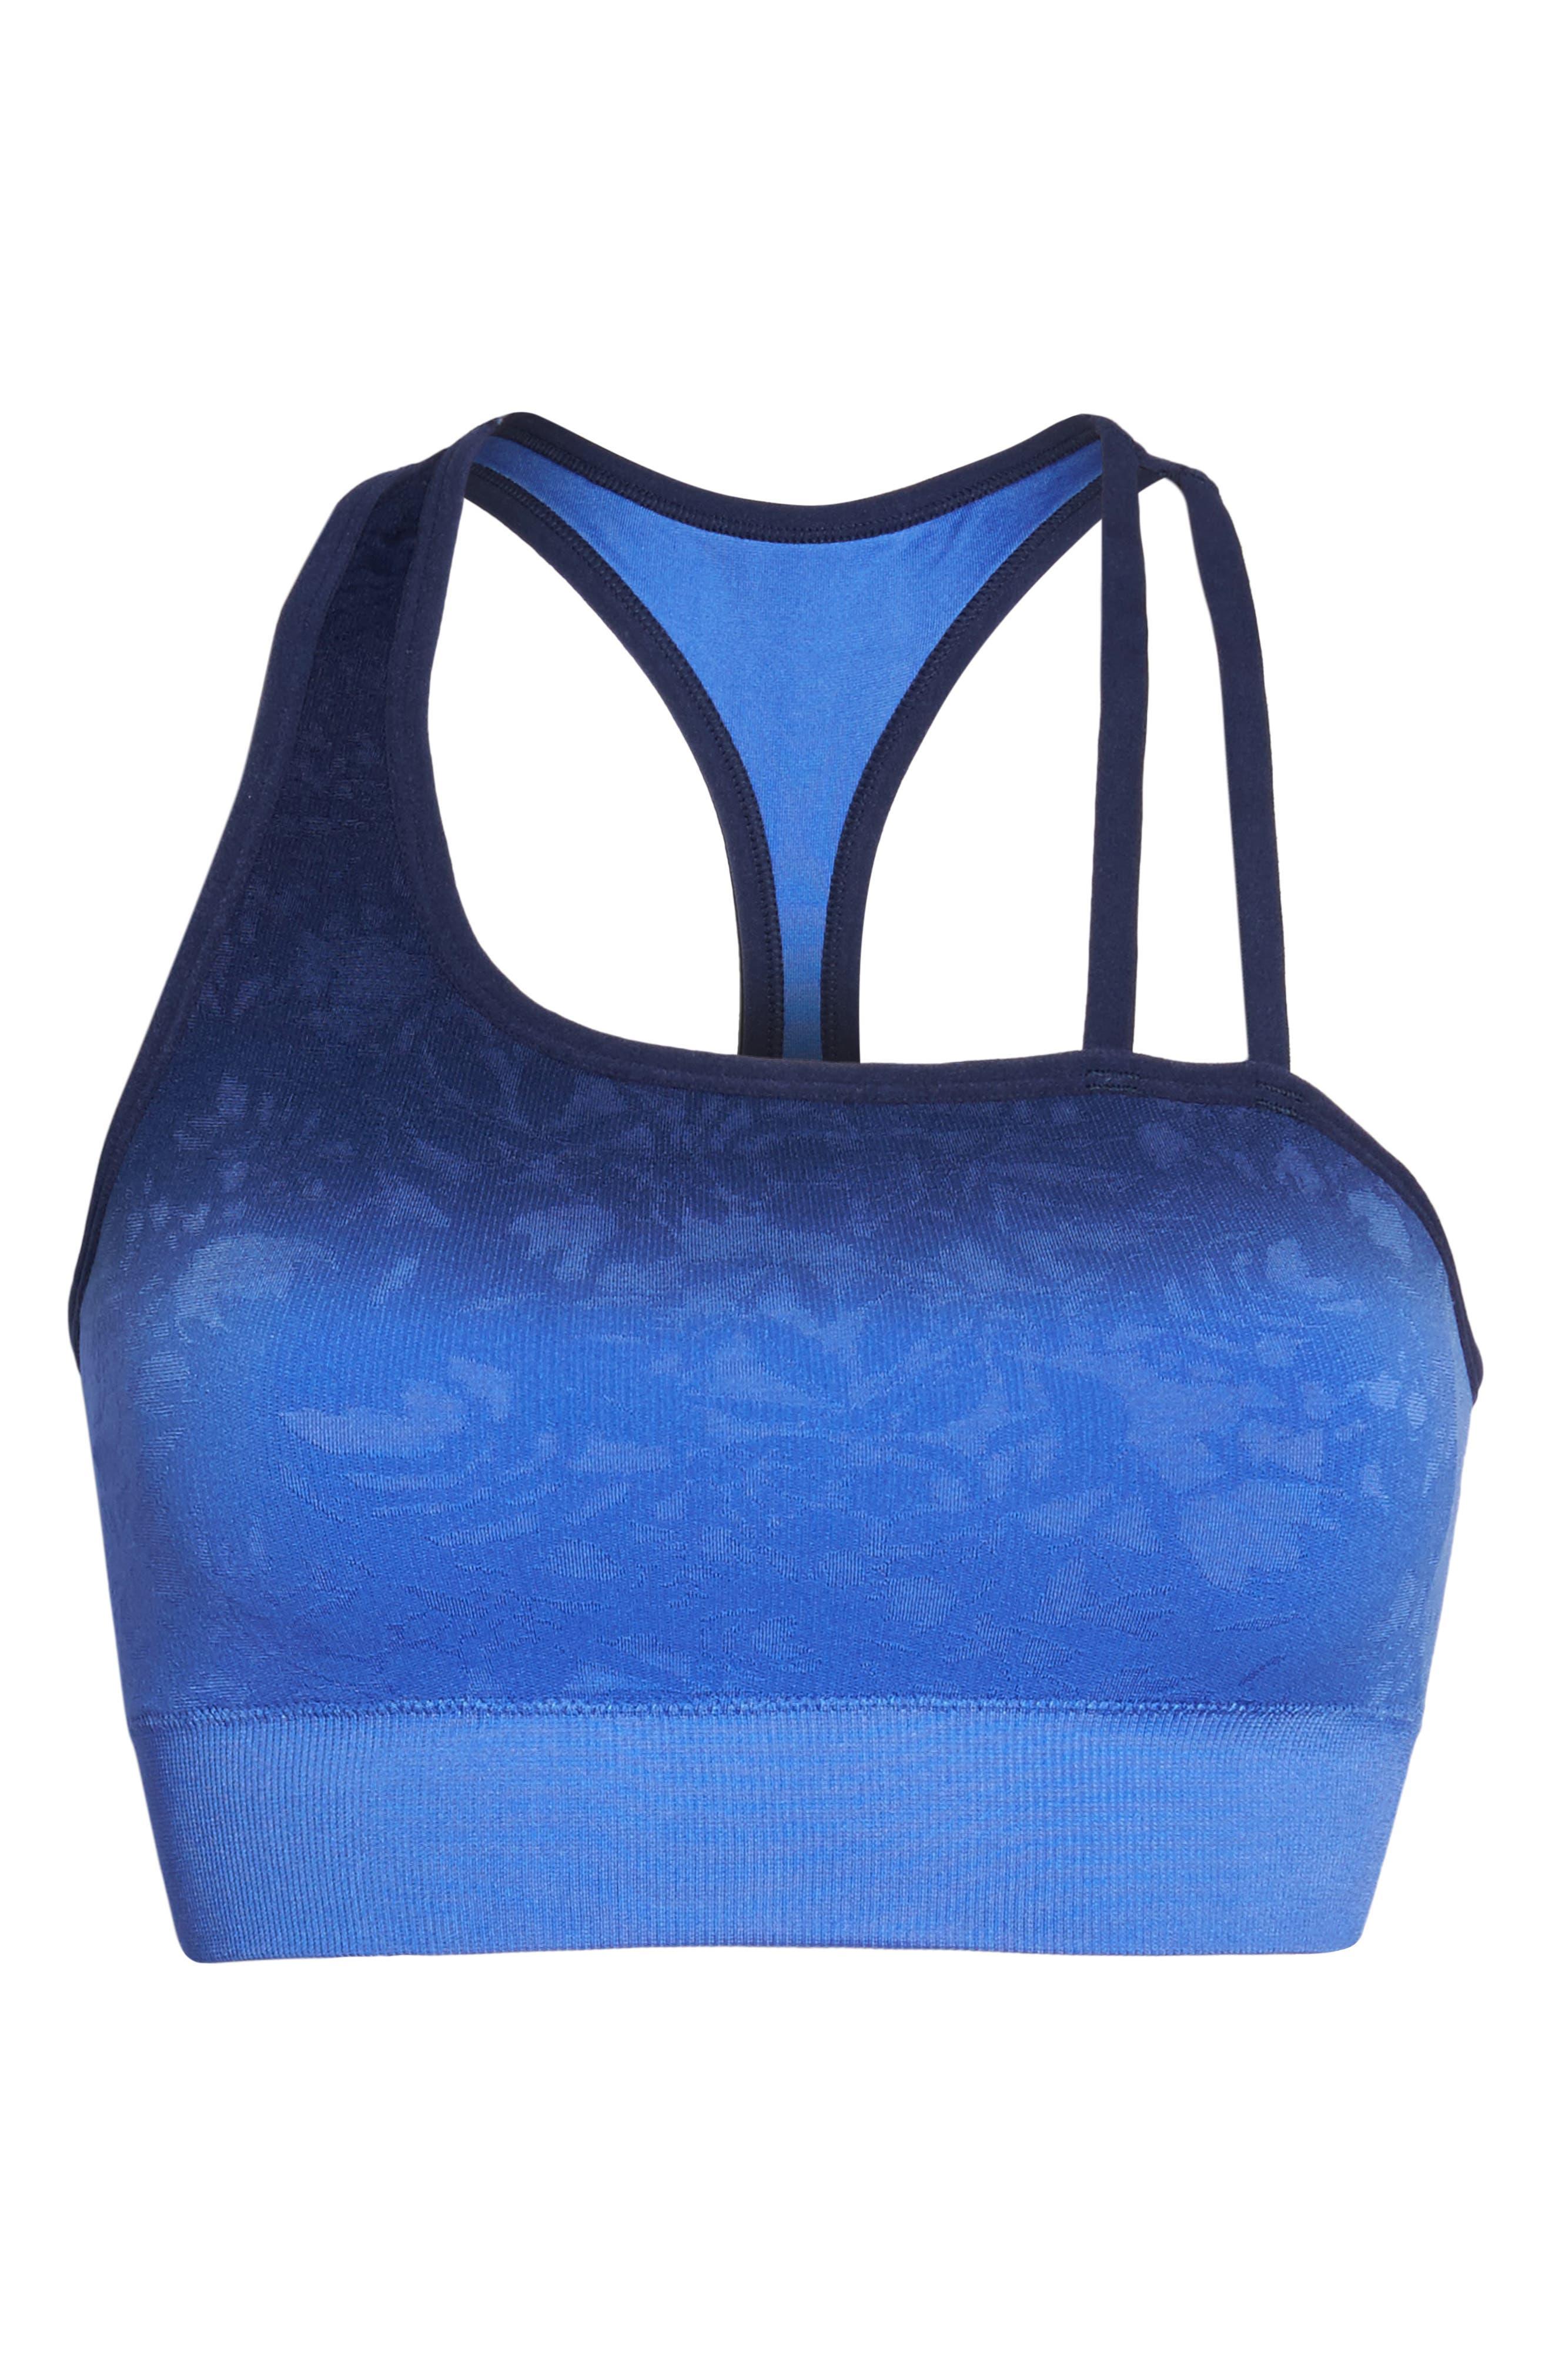 Formation Sports Bra,                             Alternate thumbnail 7, color,                             Amparo Blue W/ Medieval Blue